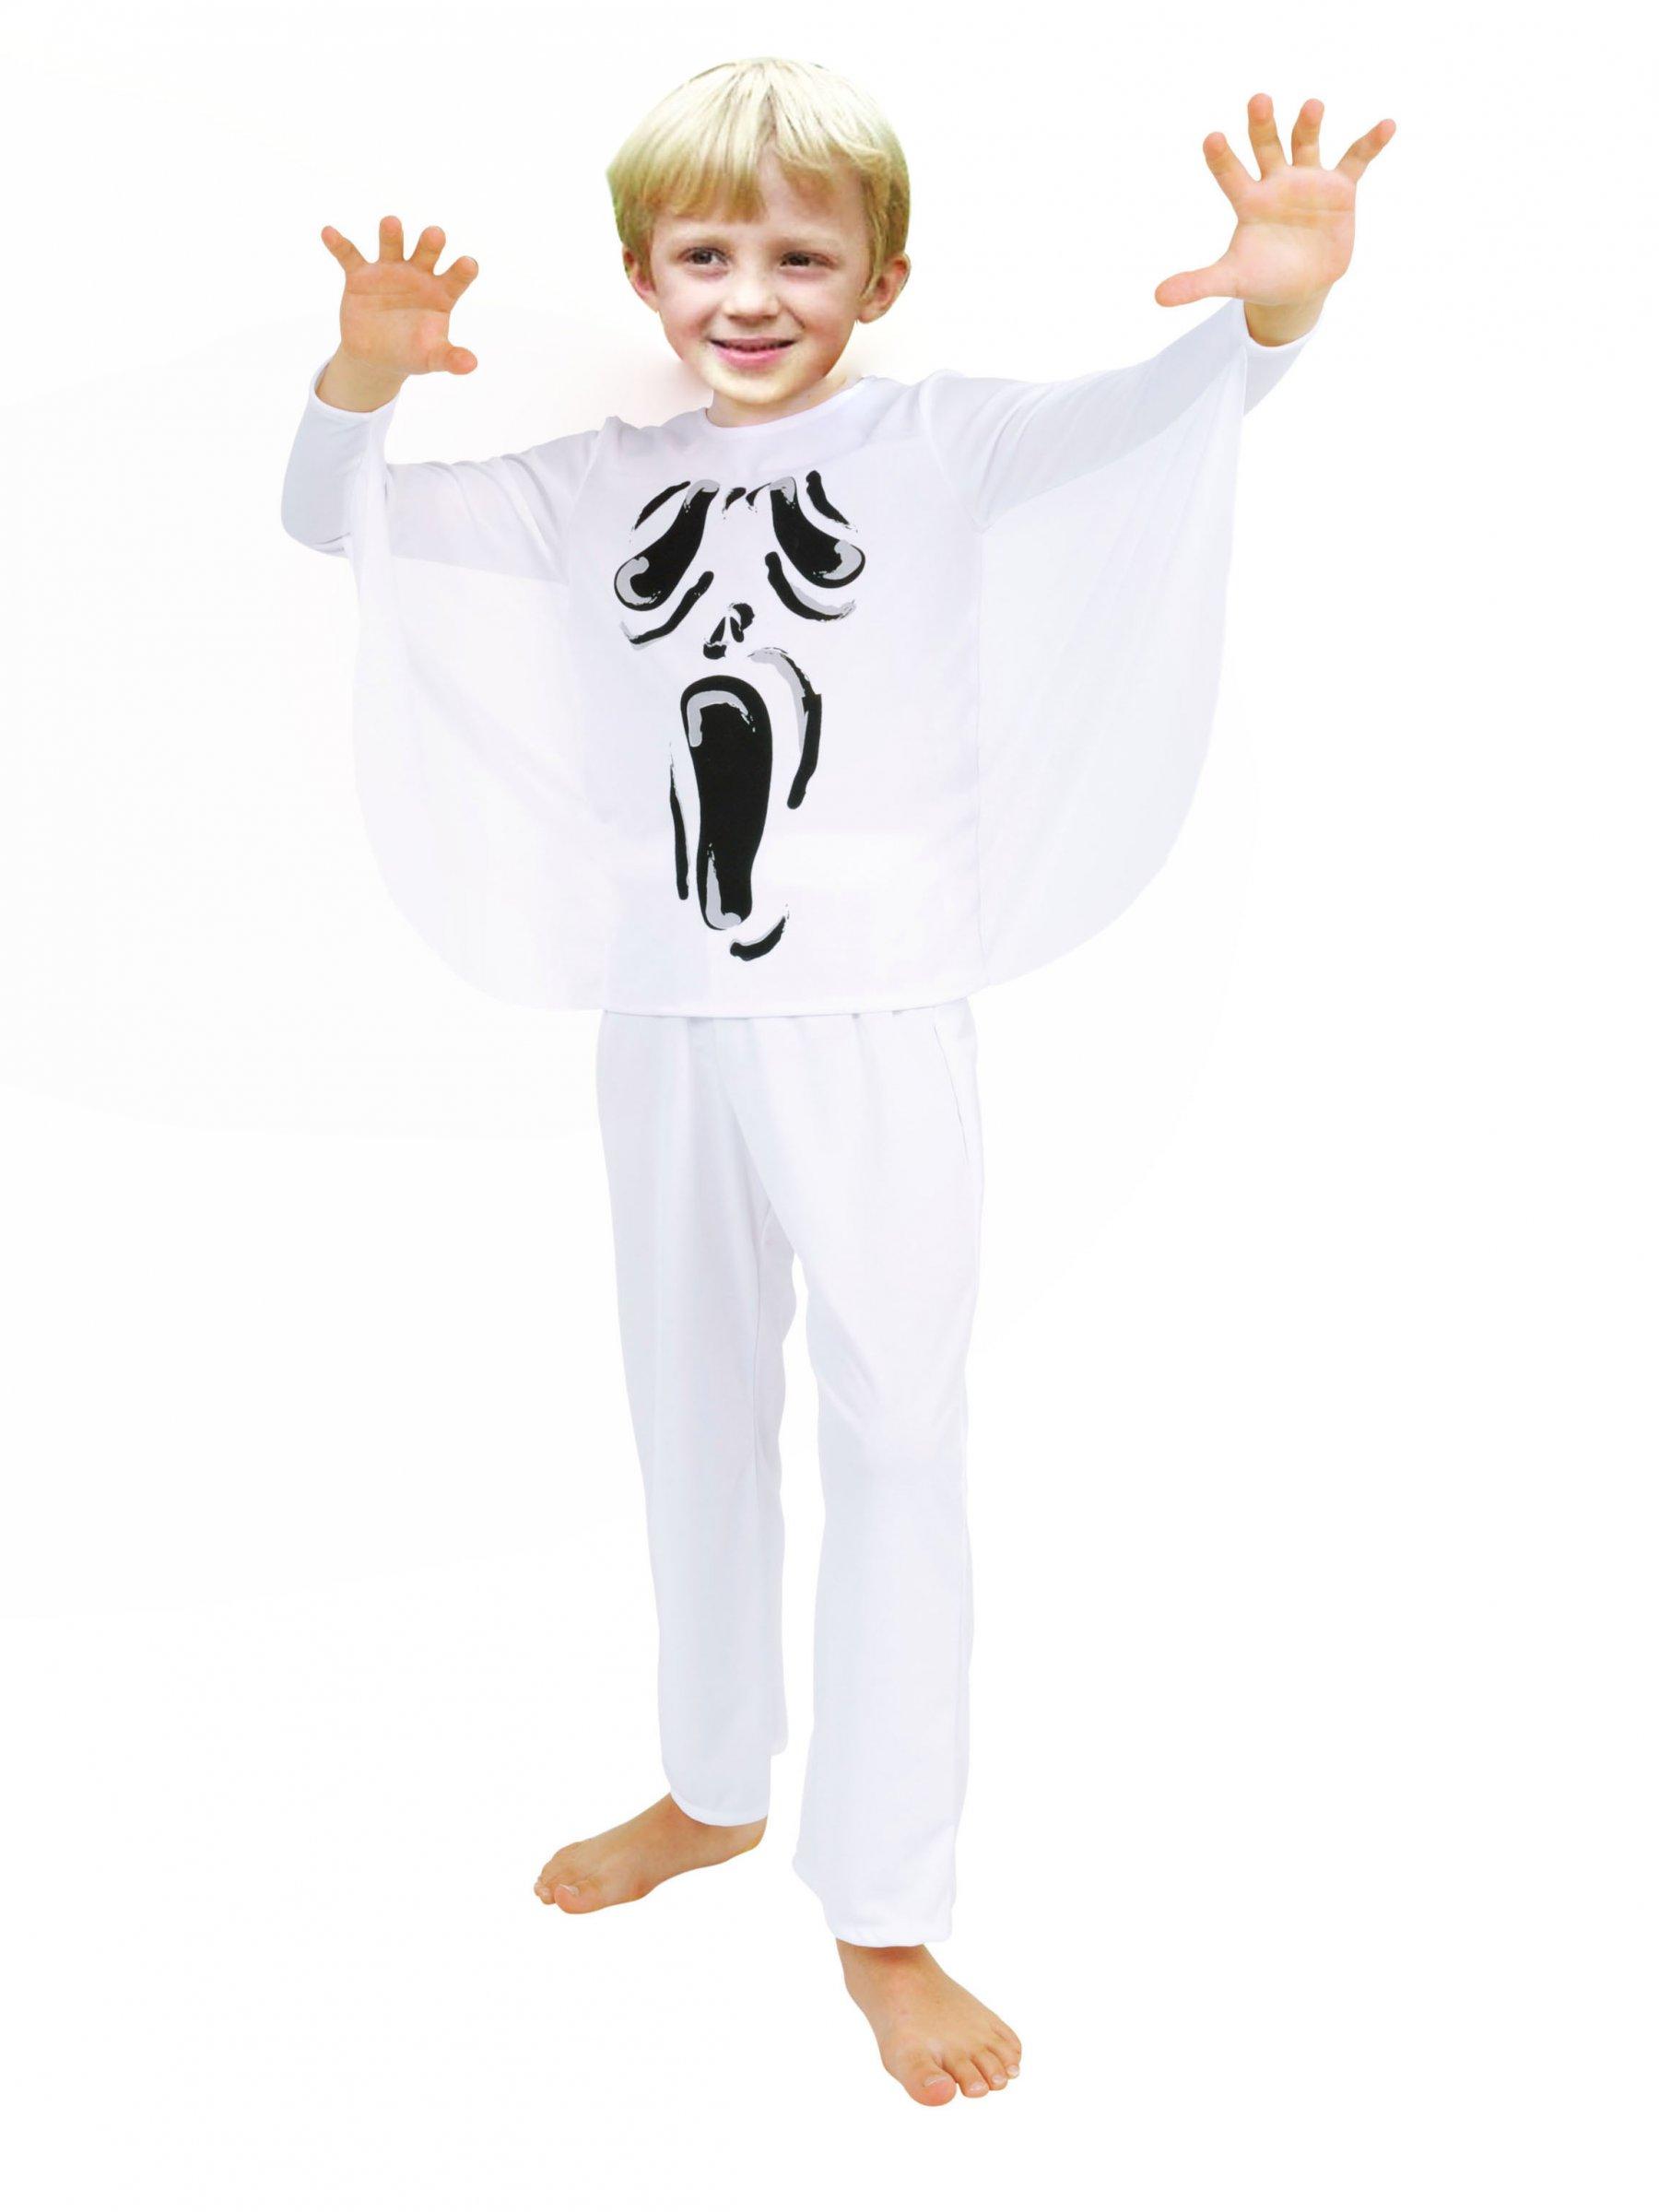 D guisement fant me hurlant enfant halloween deguise toi achat de d guisements enfants - Deguisement halloween enfant ...